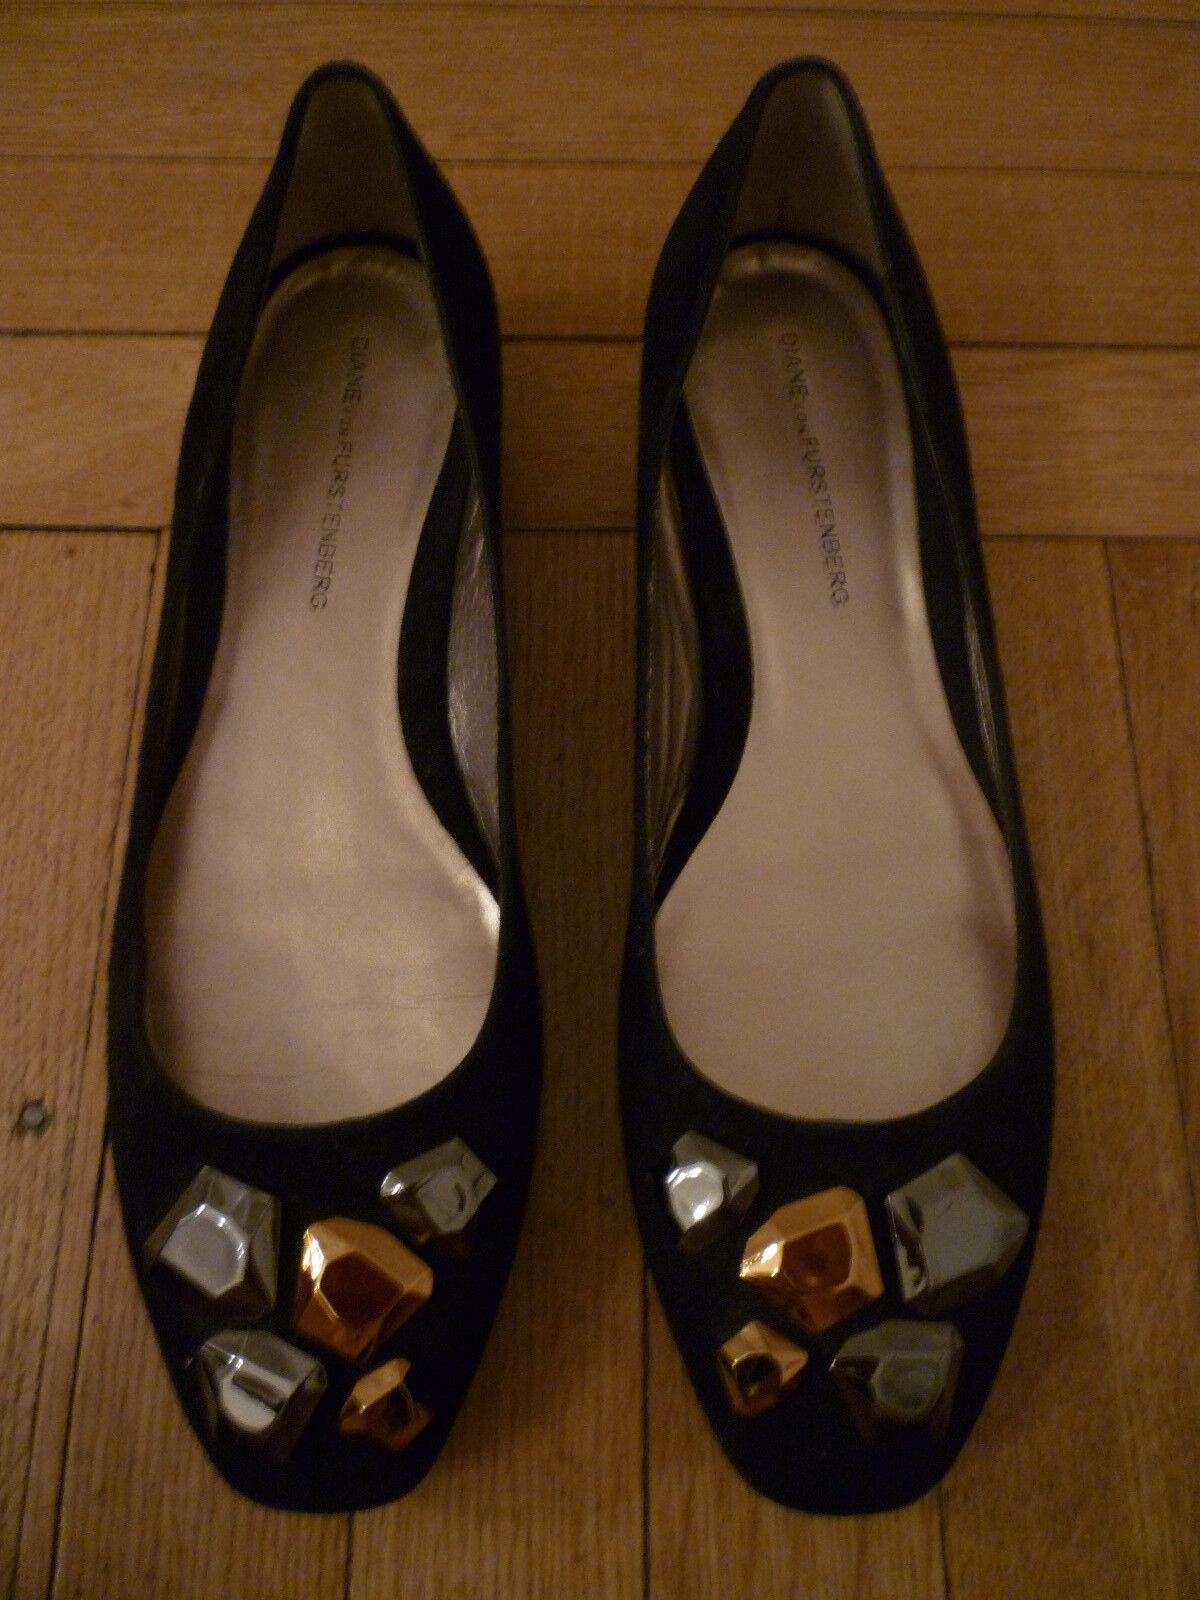 Tieks By Gavrieli Ballet Flats Leather Matte 8 Nero Donna's US Size 8 Matte 98d2bd